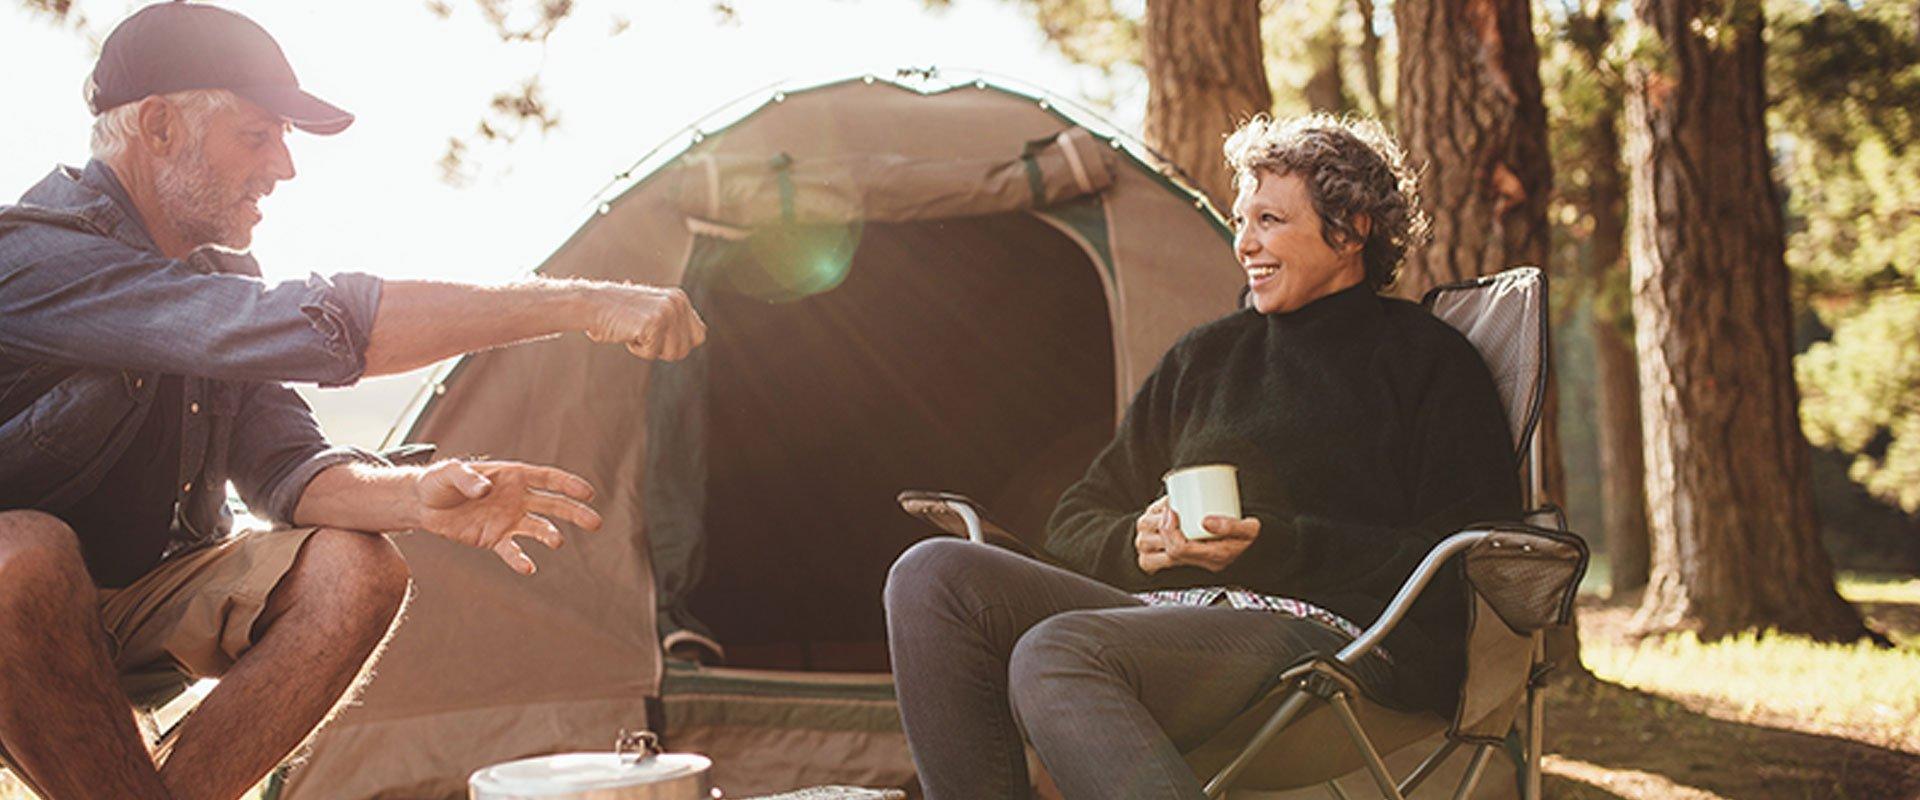 Senior couple camping date